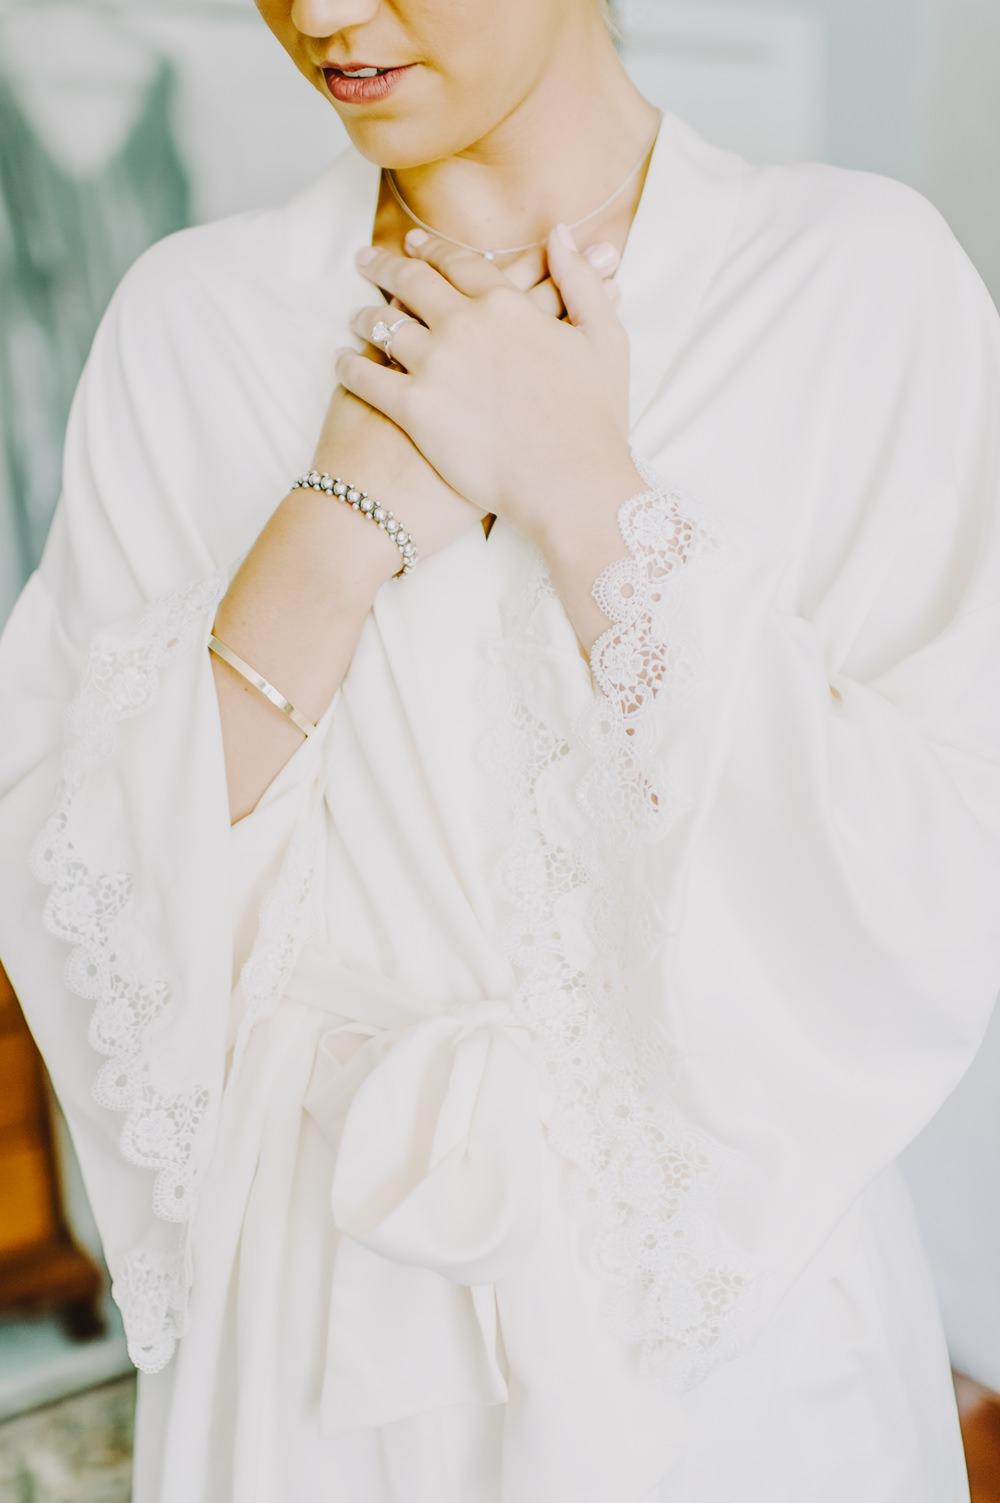 Dressing Gown Robe Bride Bridal Maryland Wedding L. Hewitt Photography